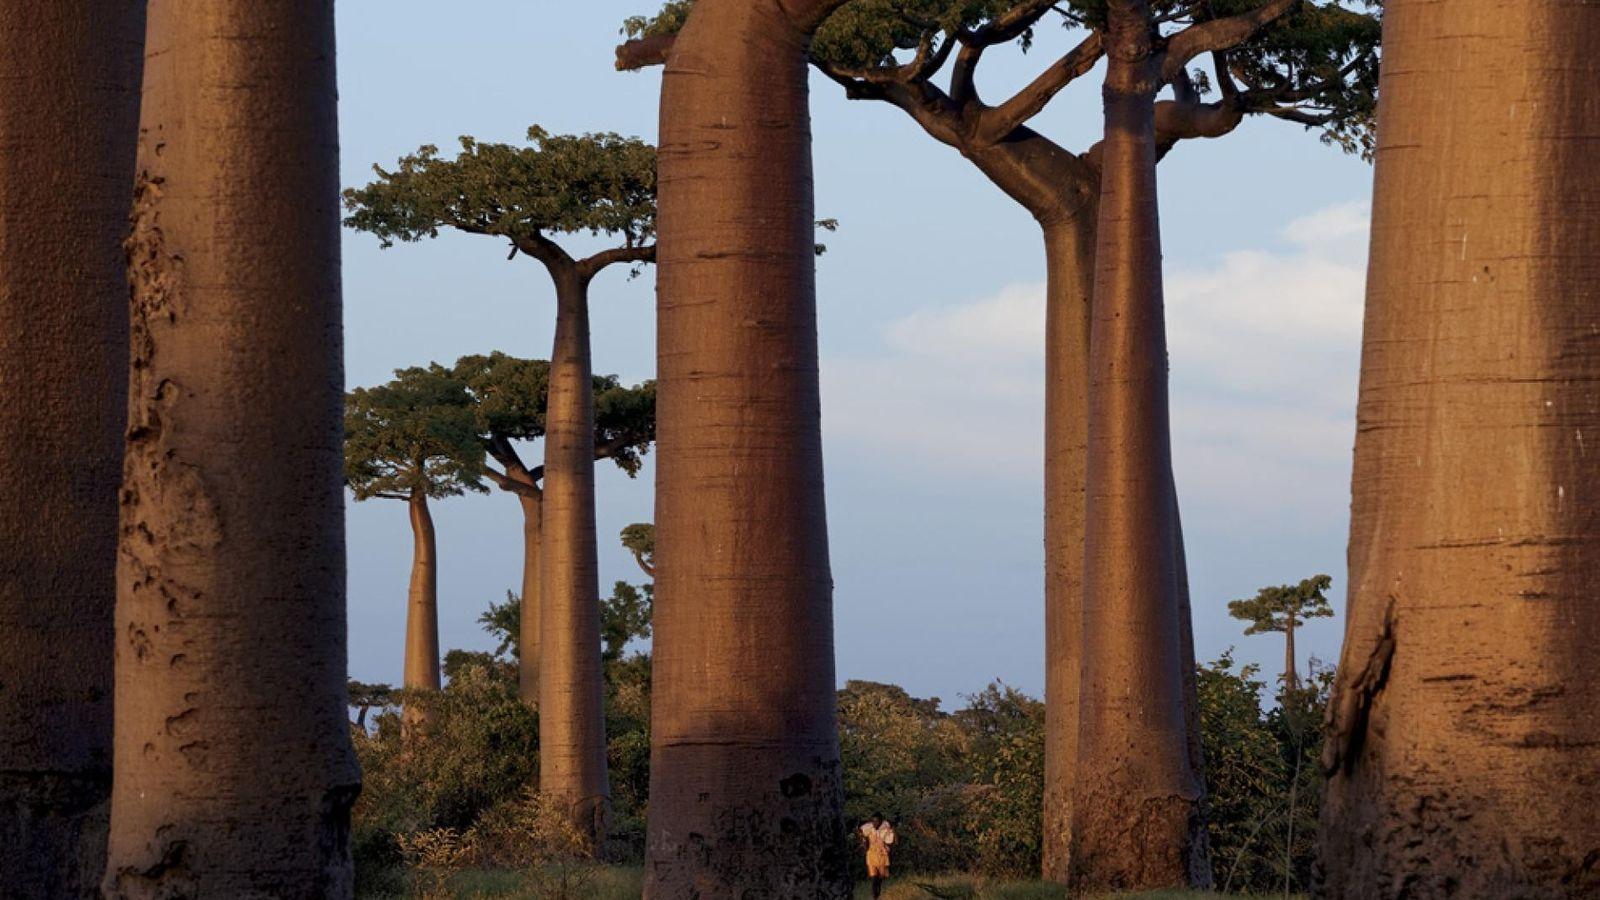 Madagascar lance un vaste projet de reforestation